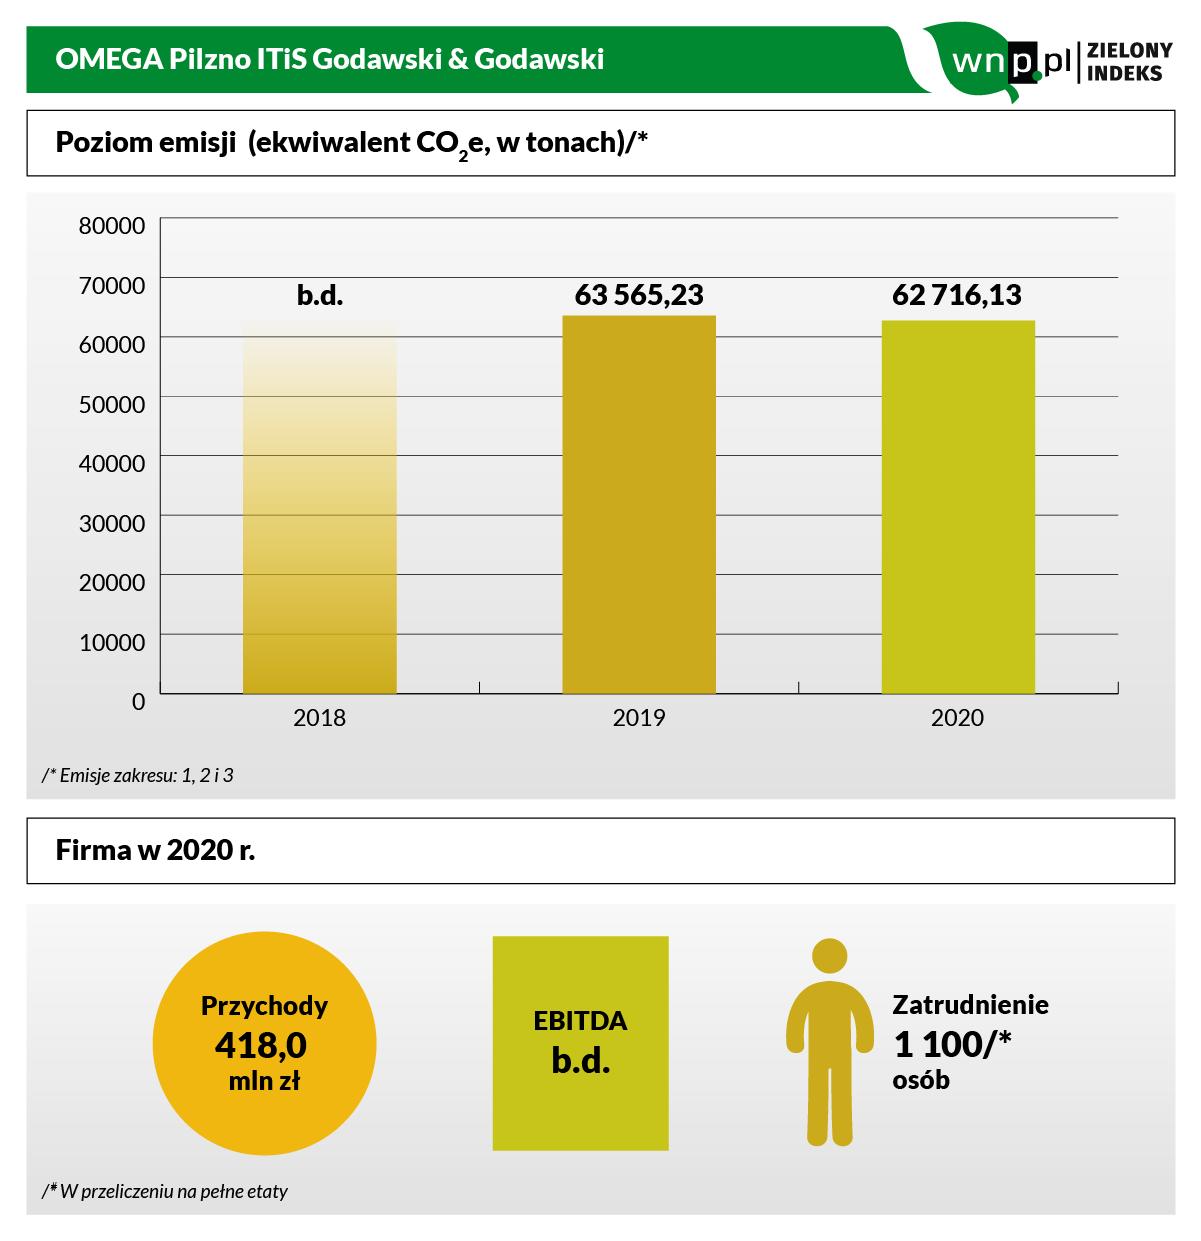 Omega Pilzno do Zielonego Indeksu-2.png